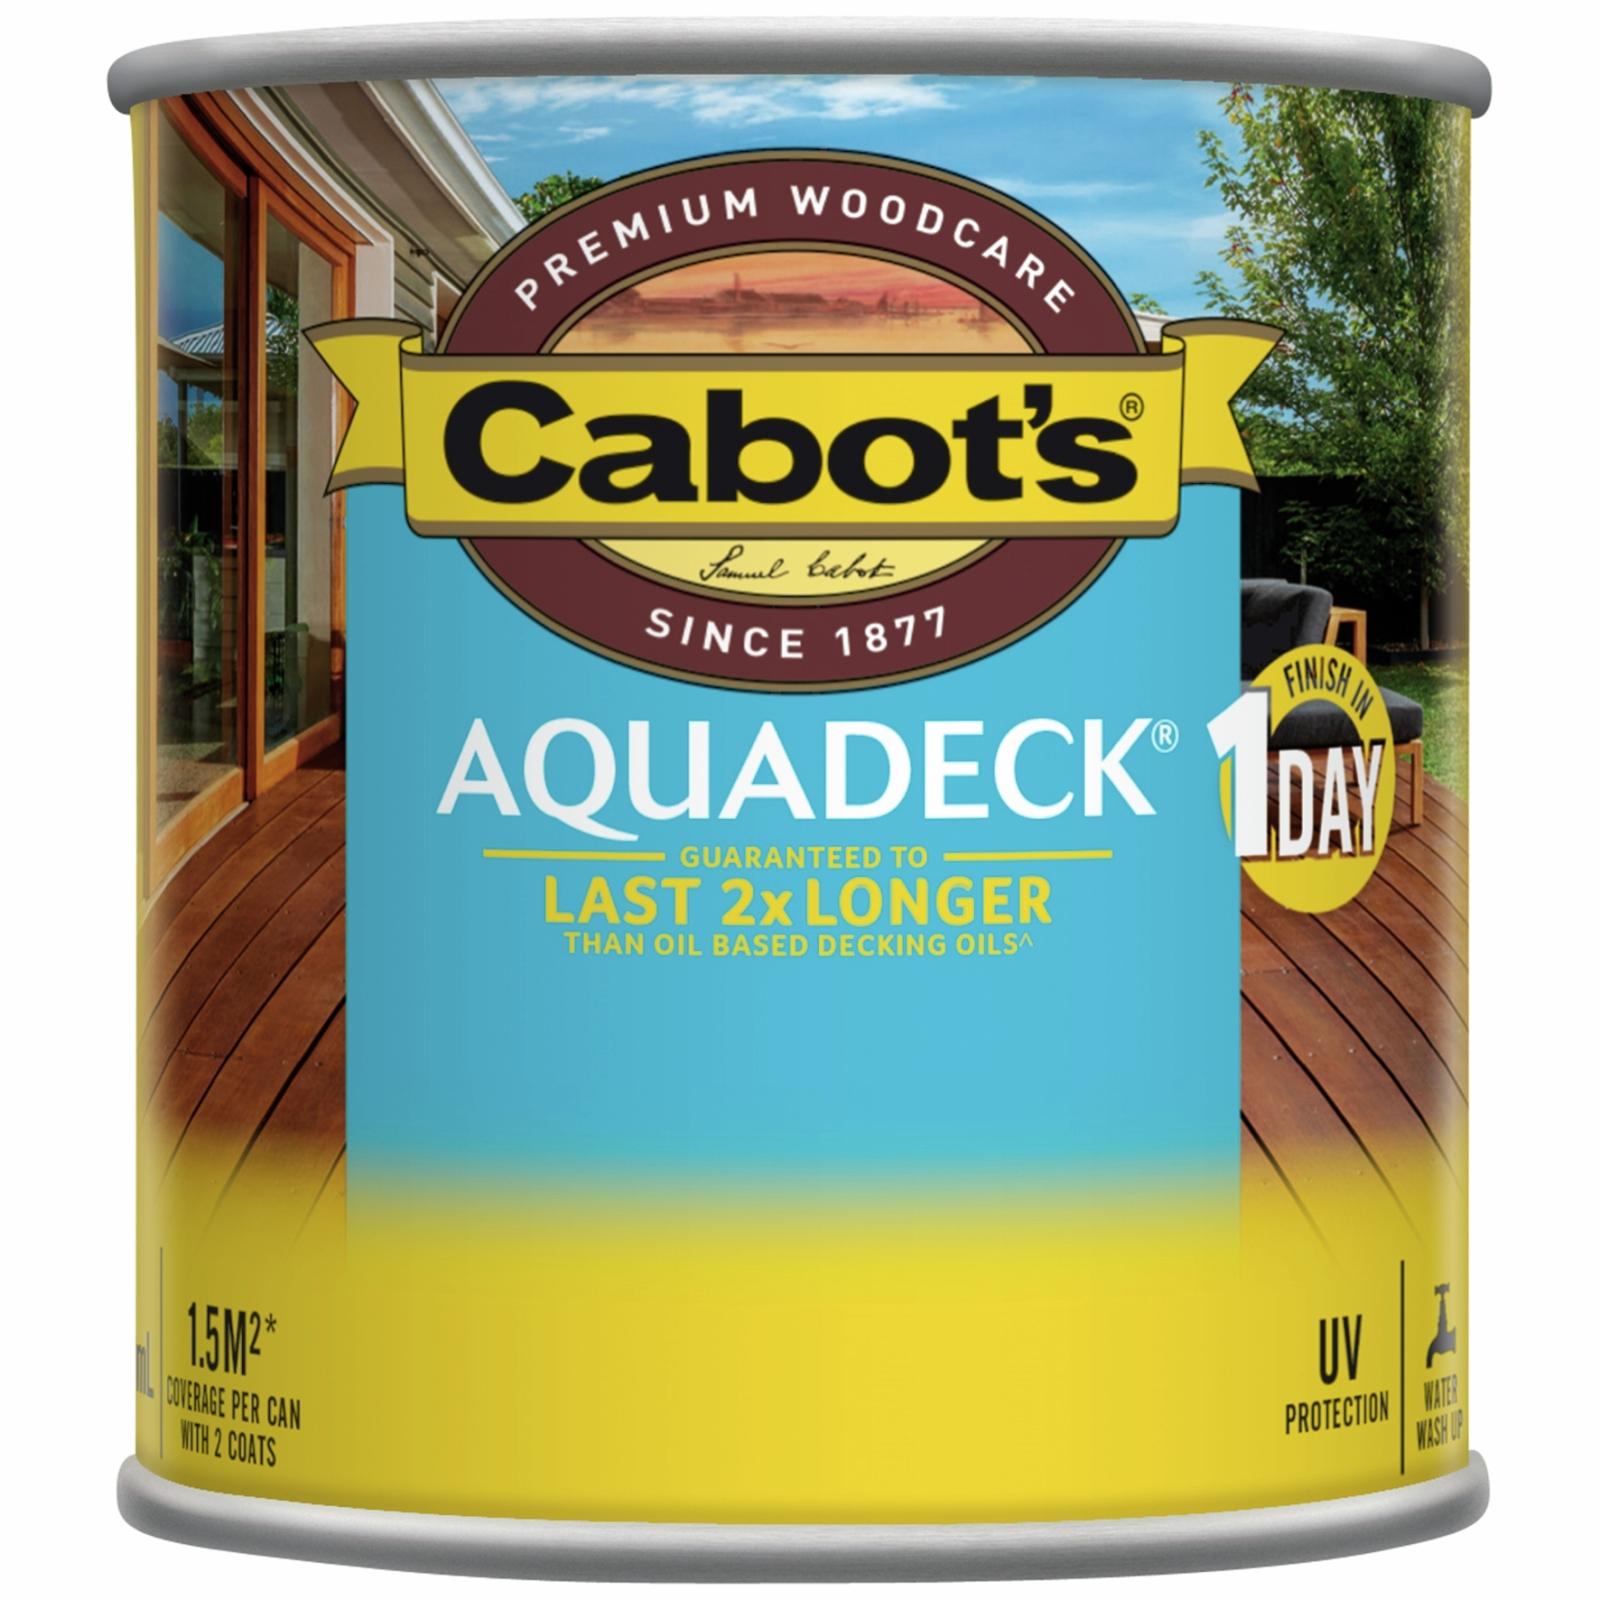 Cabot's 250ml Waterbased Kwila Aquadeck Decking Oil